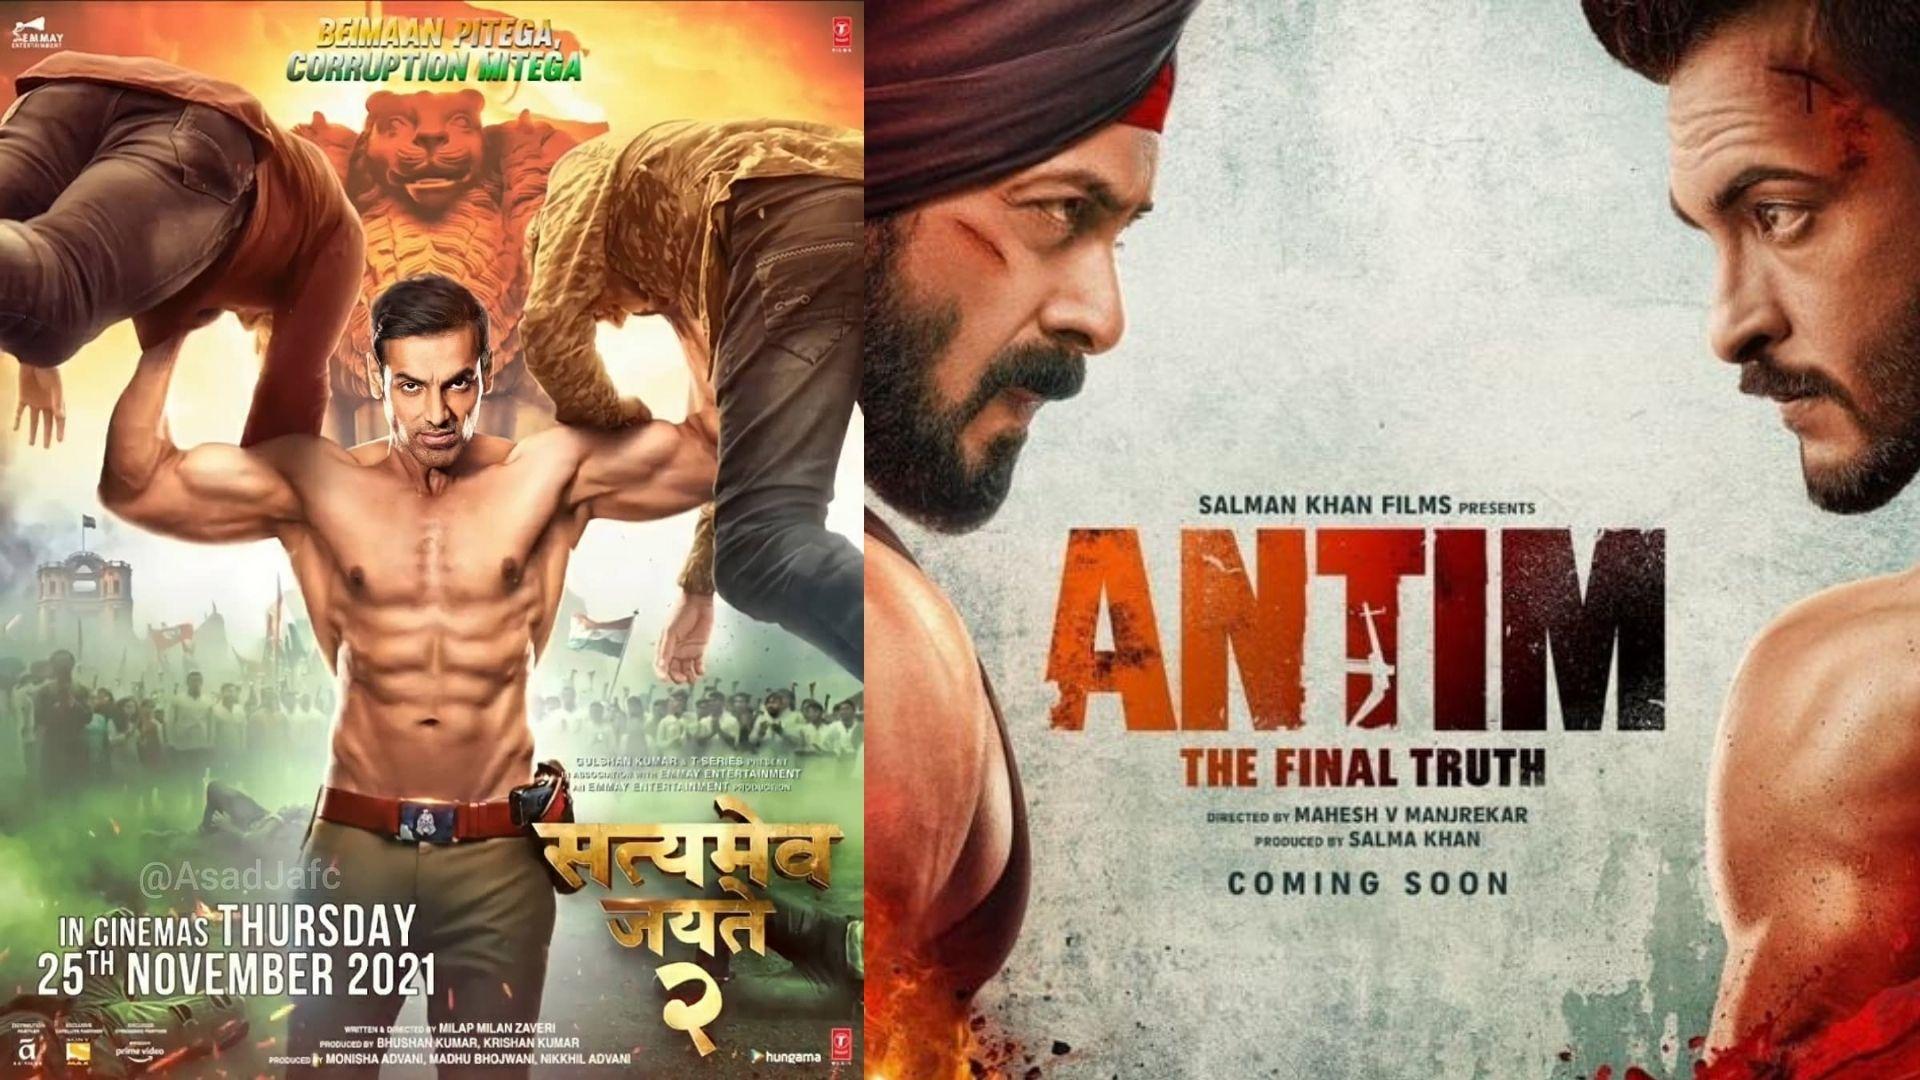 Satyamev Jayate 2 To Release On November 25; John Abraham Starrer To Clash With Salman Khan's Antim – Deets Inside